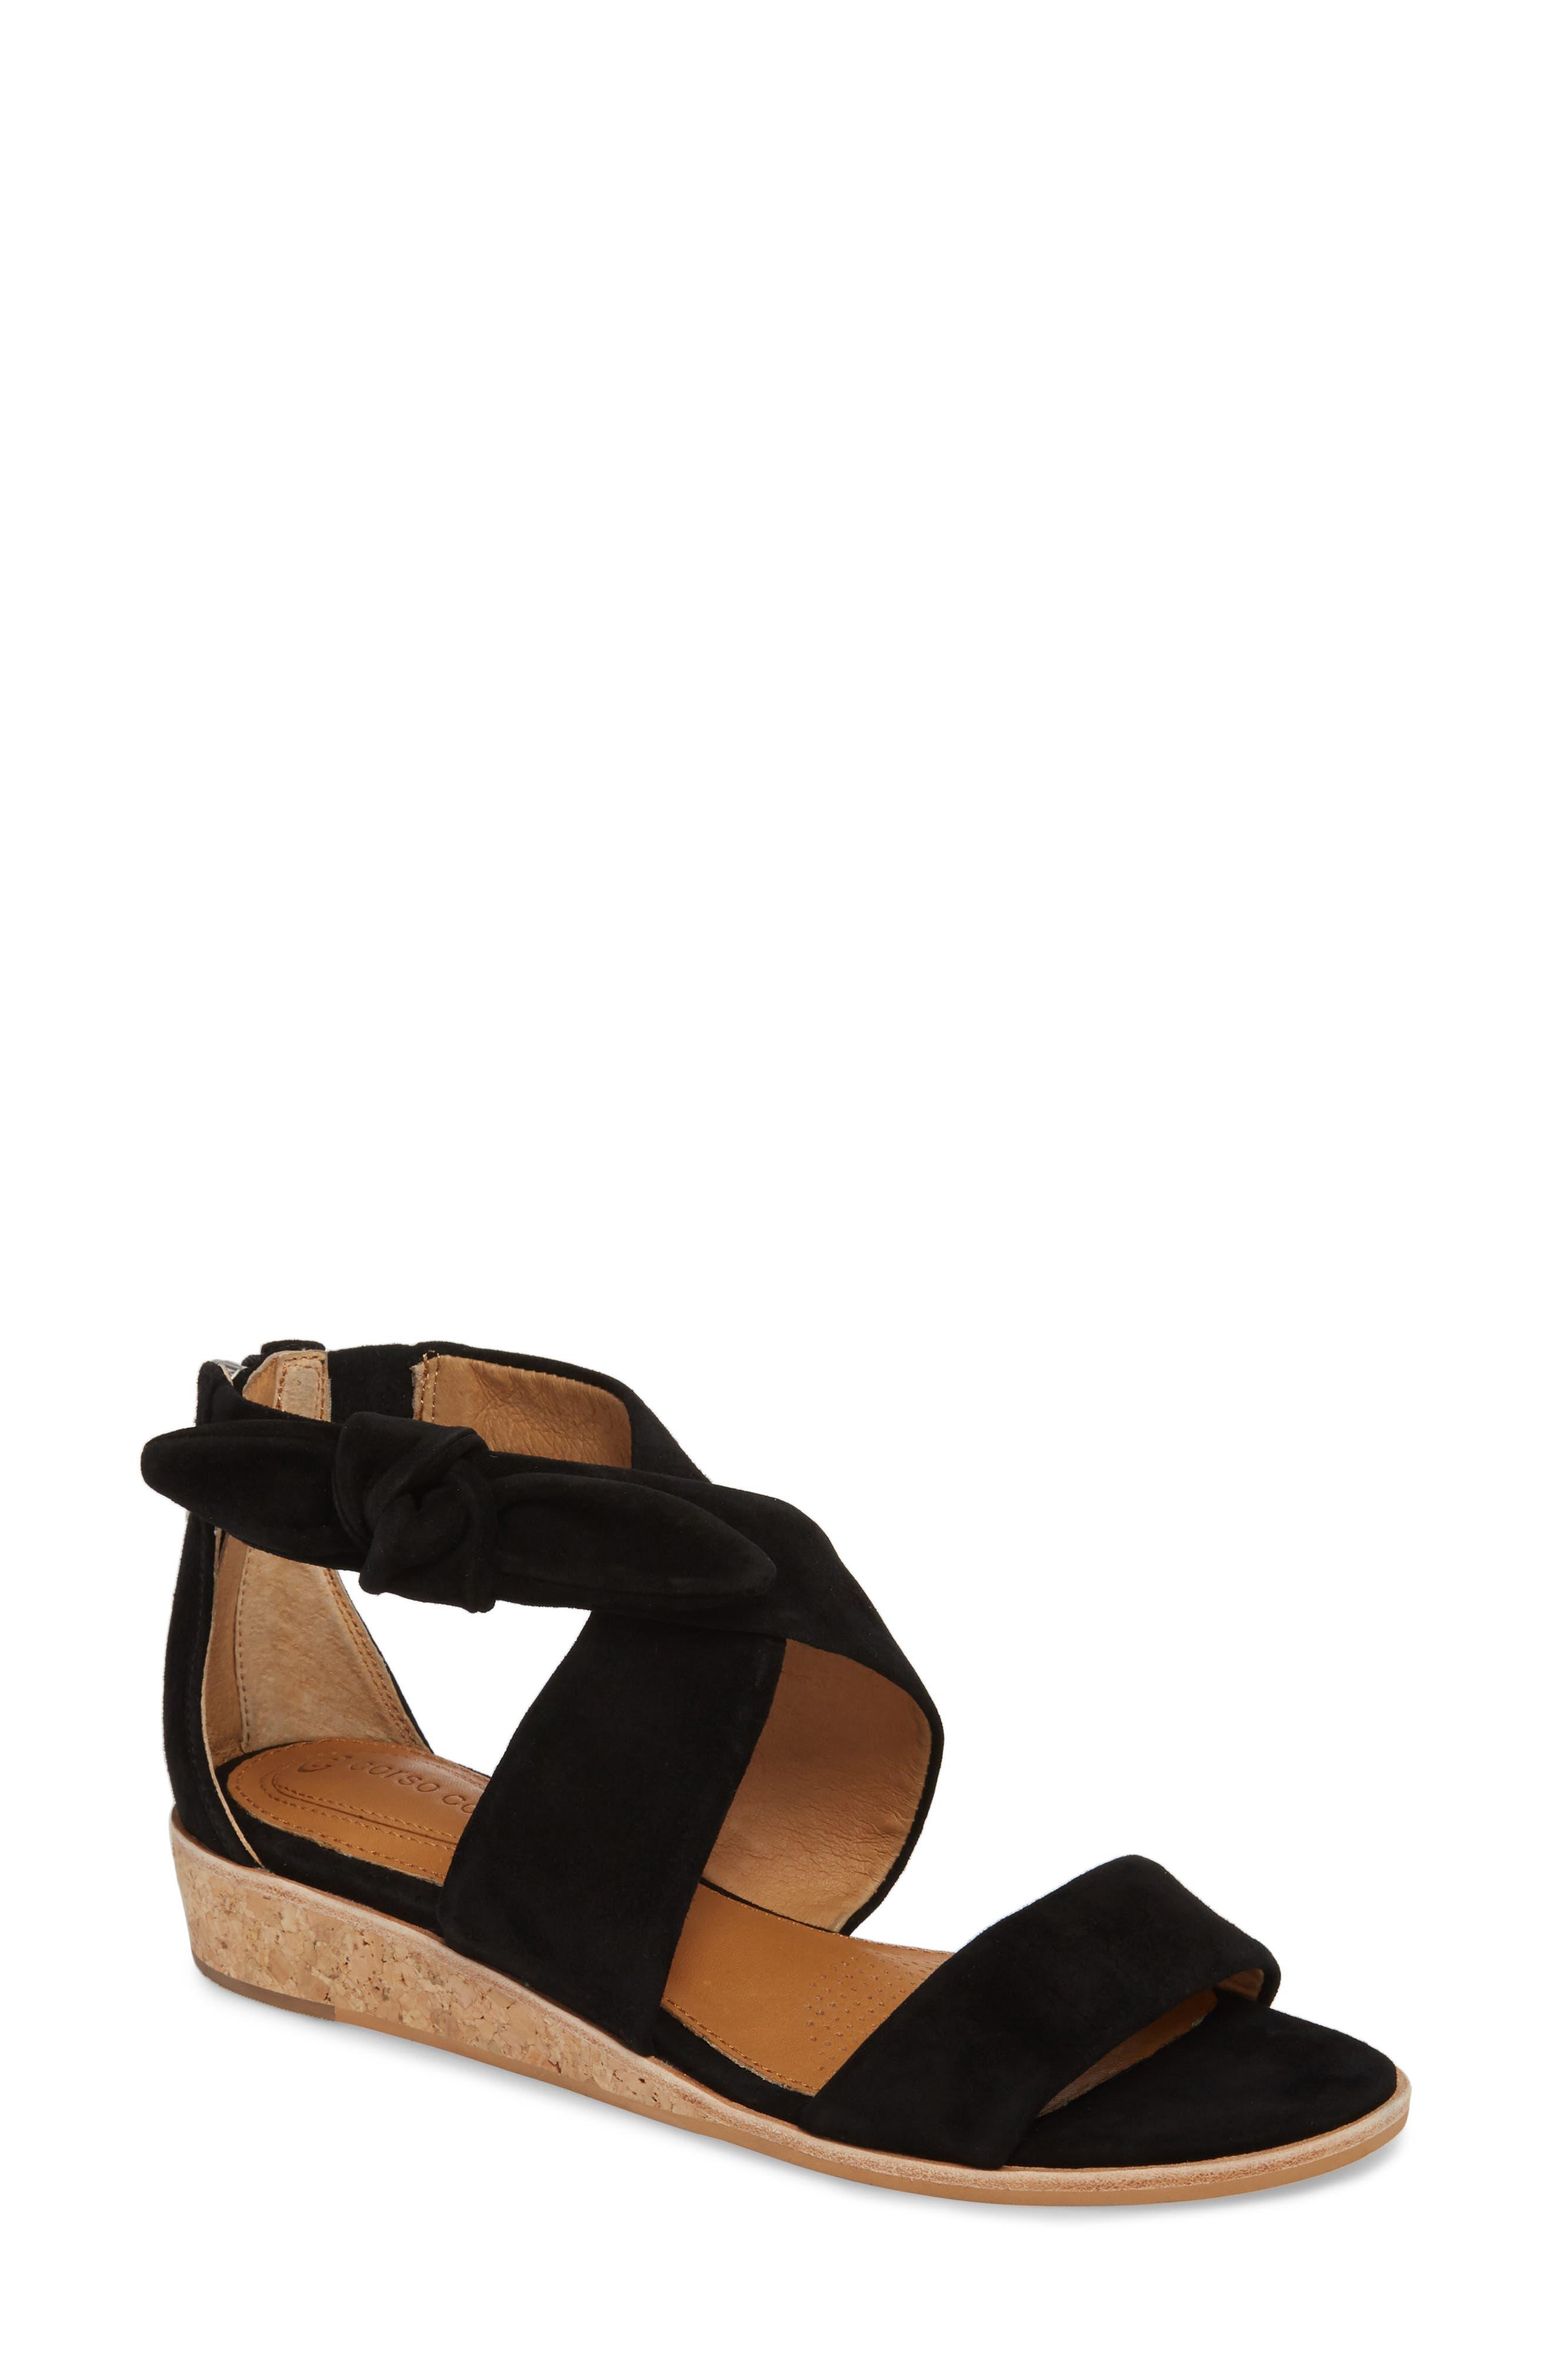 Rasque Sandal,                         Main,                         color, BLACK LEATHER